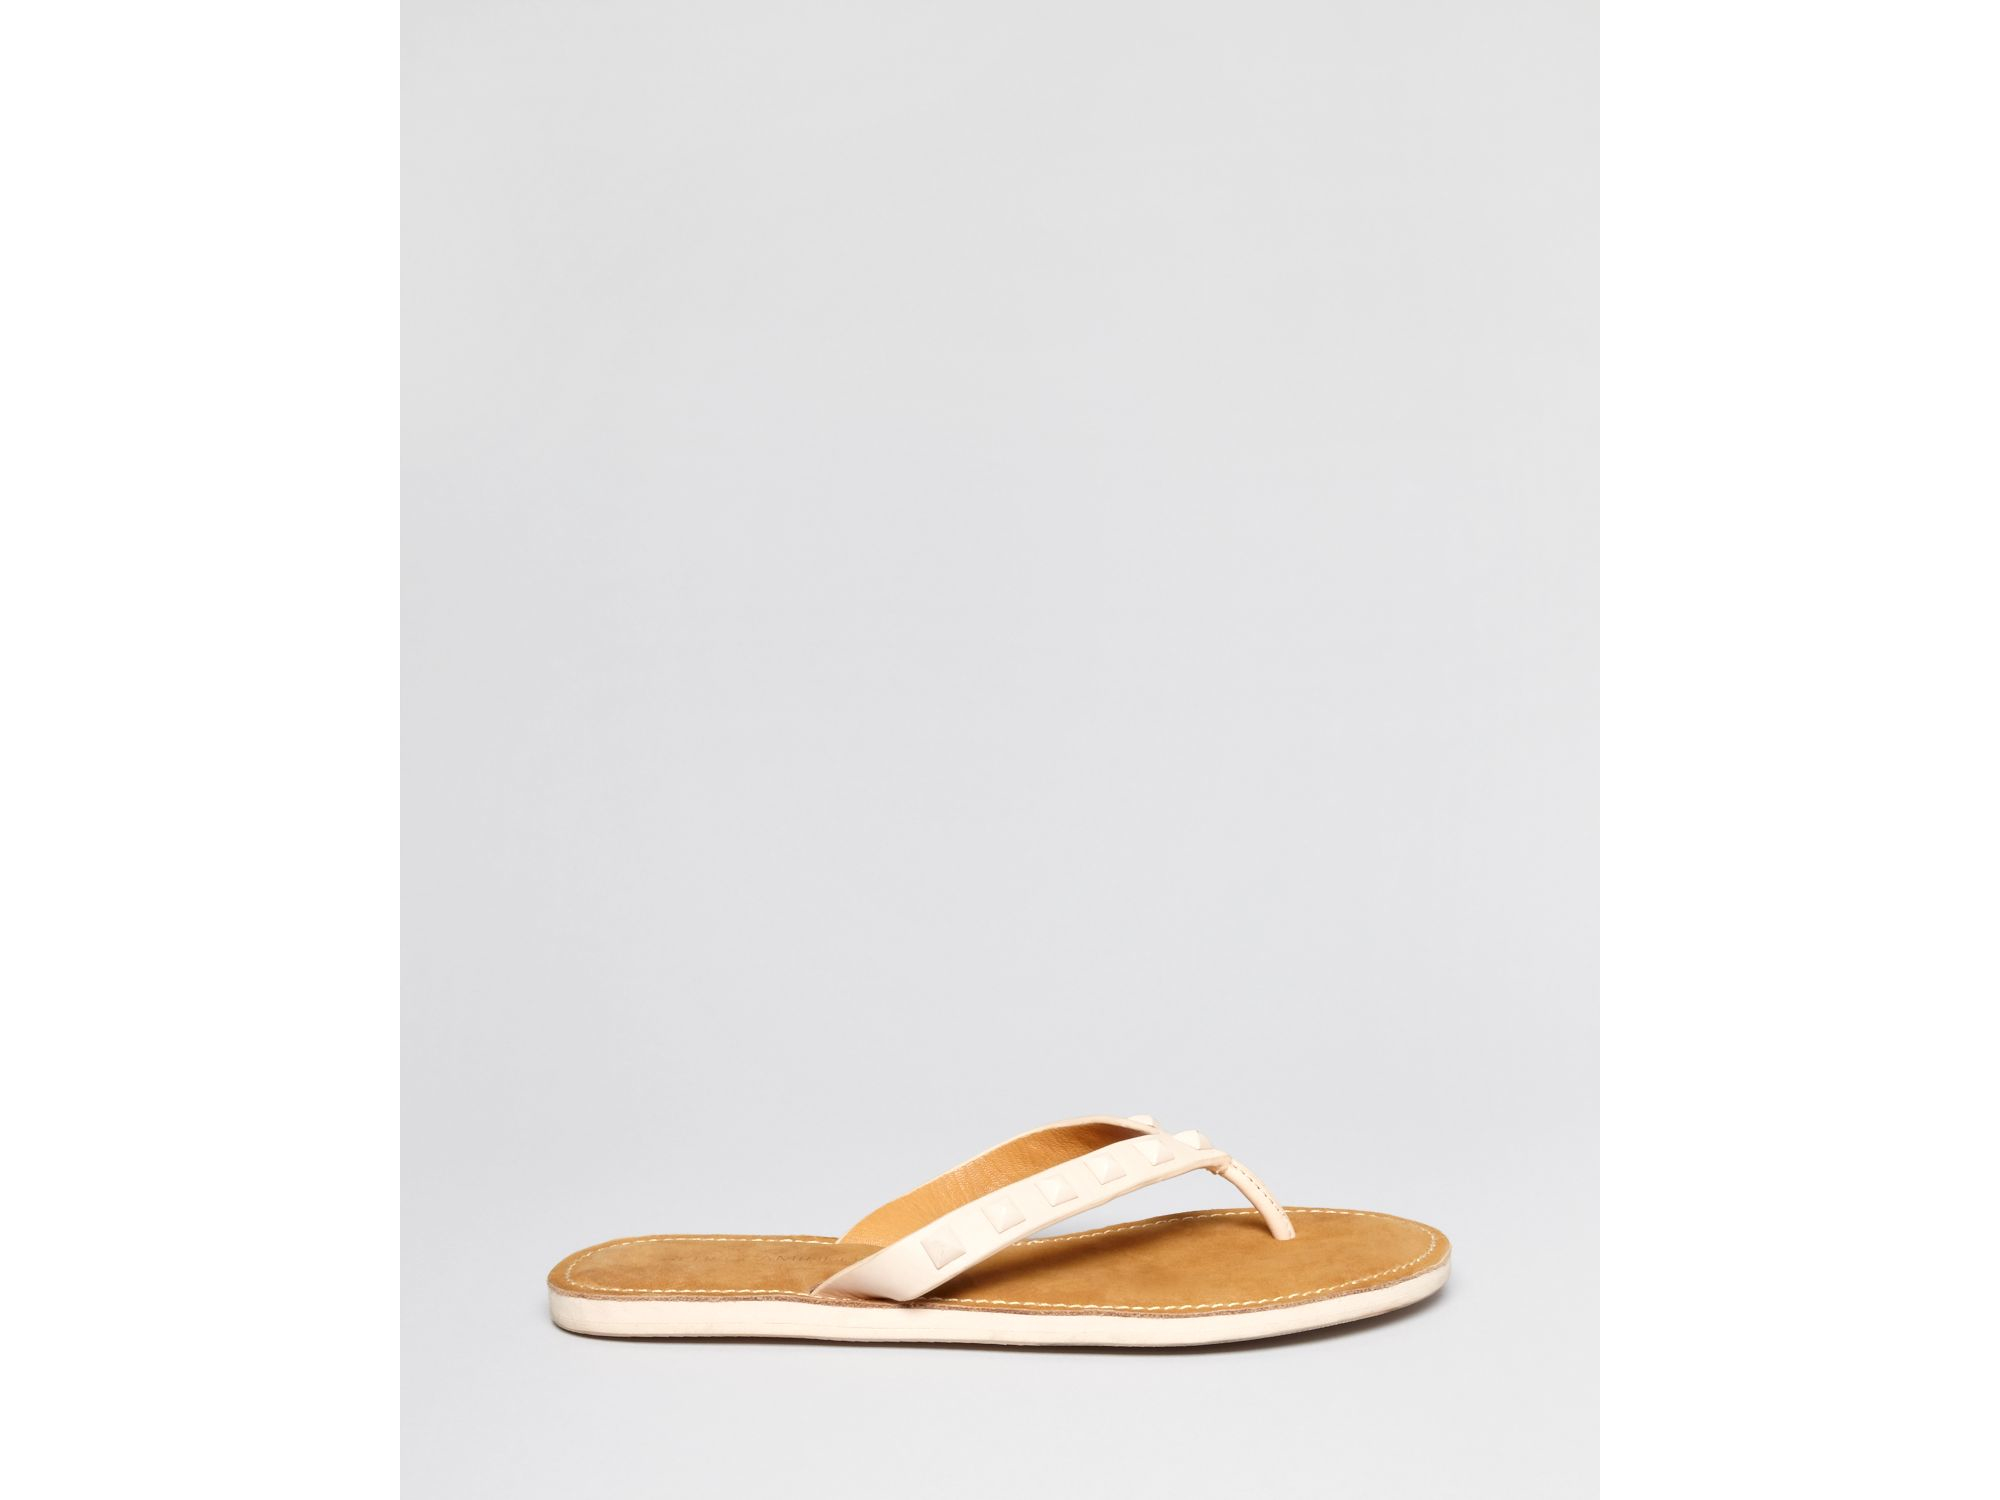 c38ec8d95d42 Lyst - Rebecca Minkoff Flat Studded Thong Sandals - Fiona in Pink